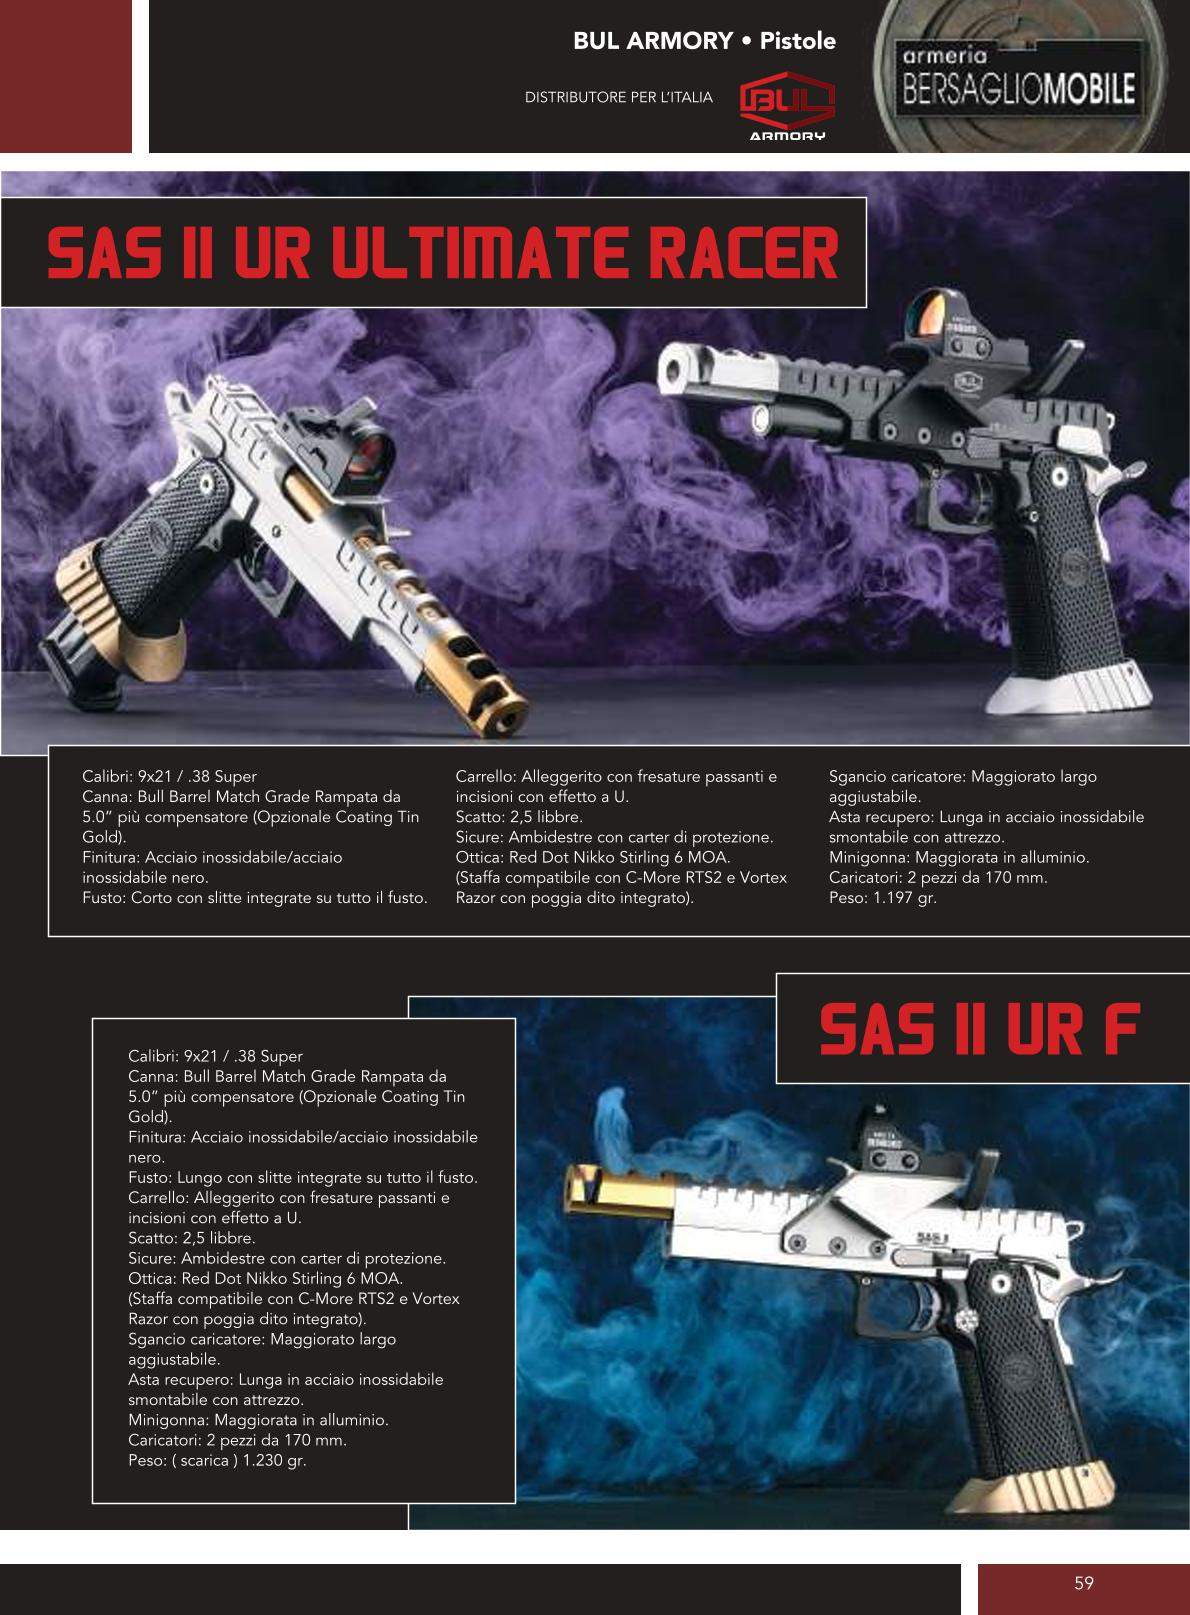 Bul Armory - Sas II UR Ultimate Racer - Sas II UR F - Armeria Bersaglio Mobile